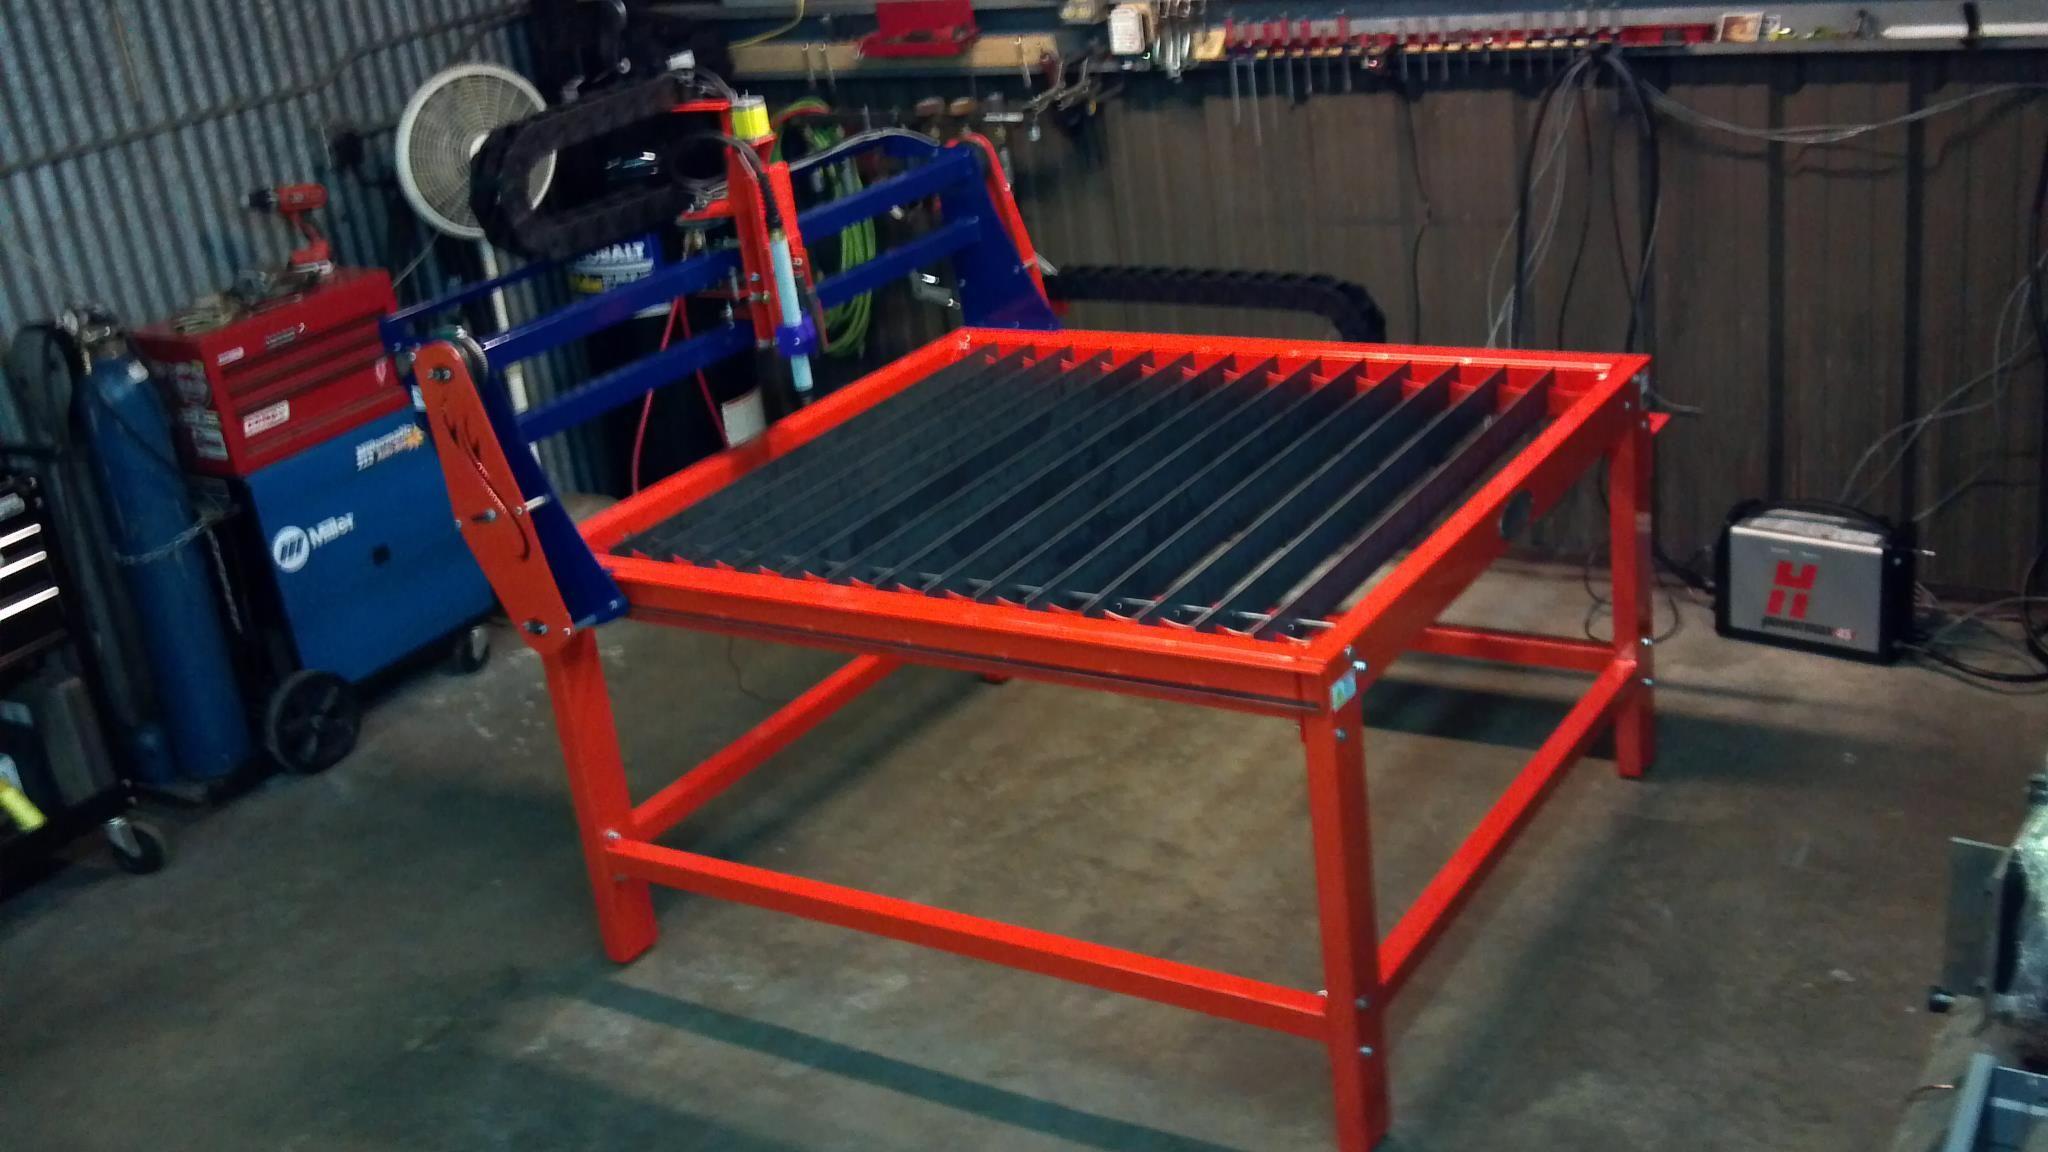 4x4 Cnc Burntables Plasma Table Metalart Wallhanging